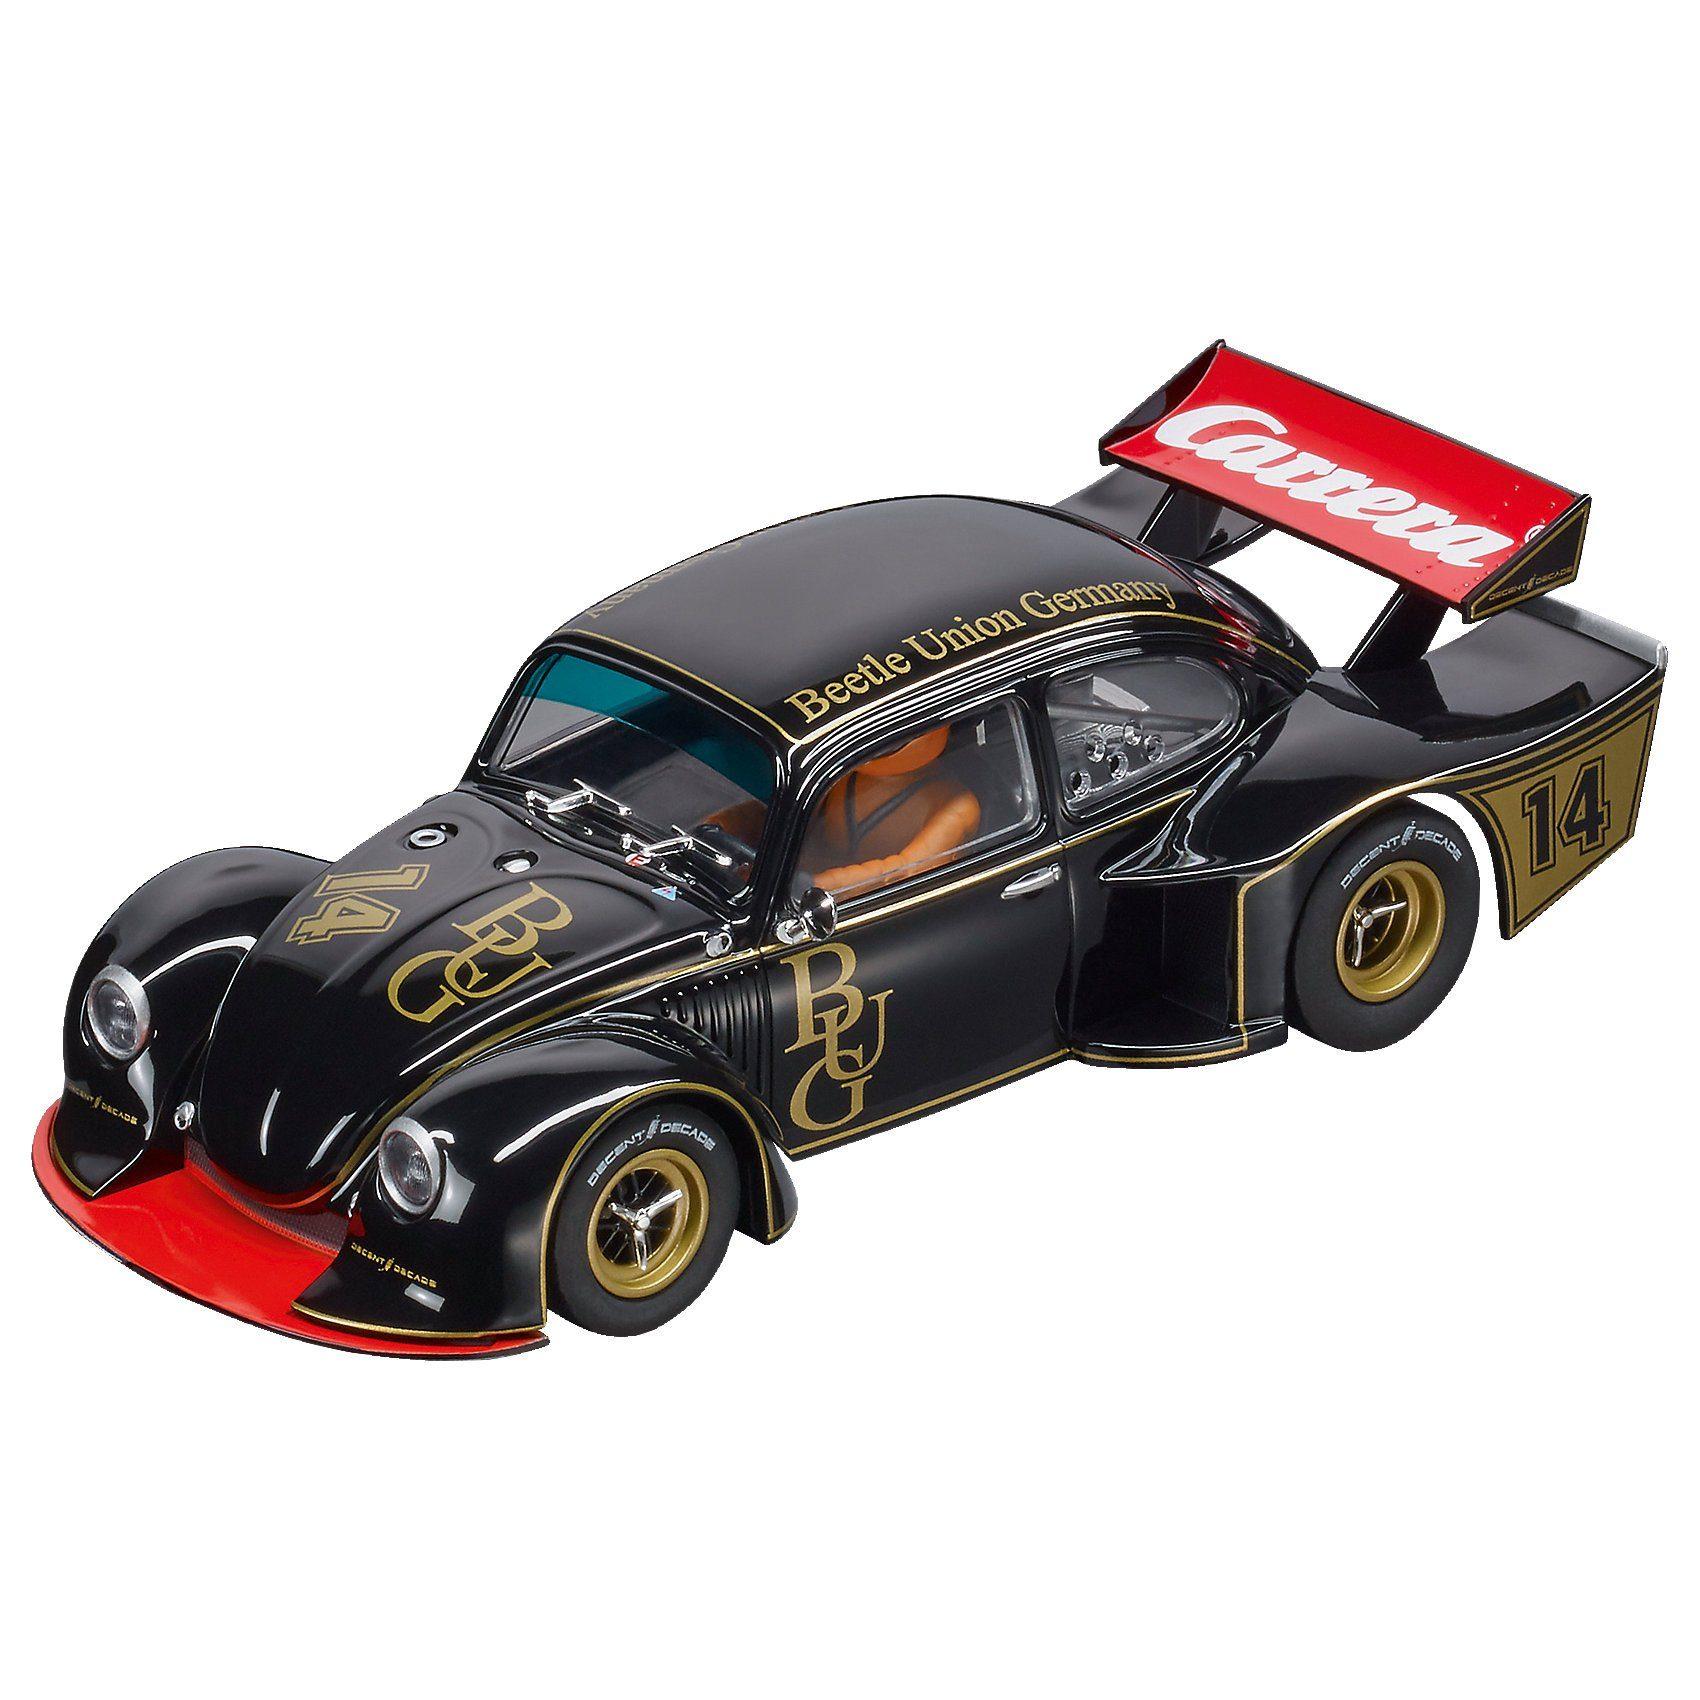 "Evolution 27557 VW Käfer ""Group 5"" Race 5"